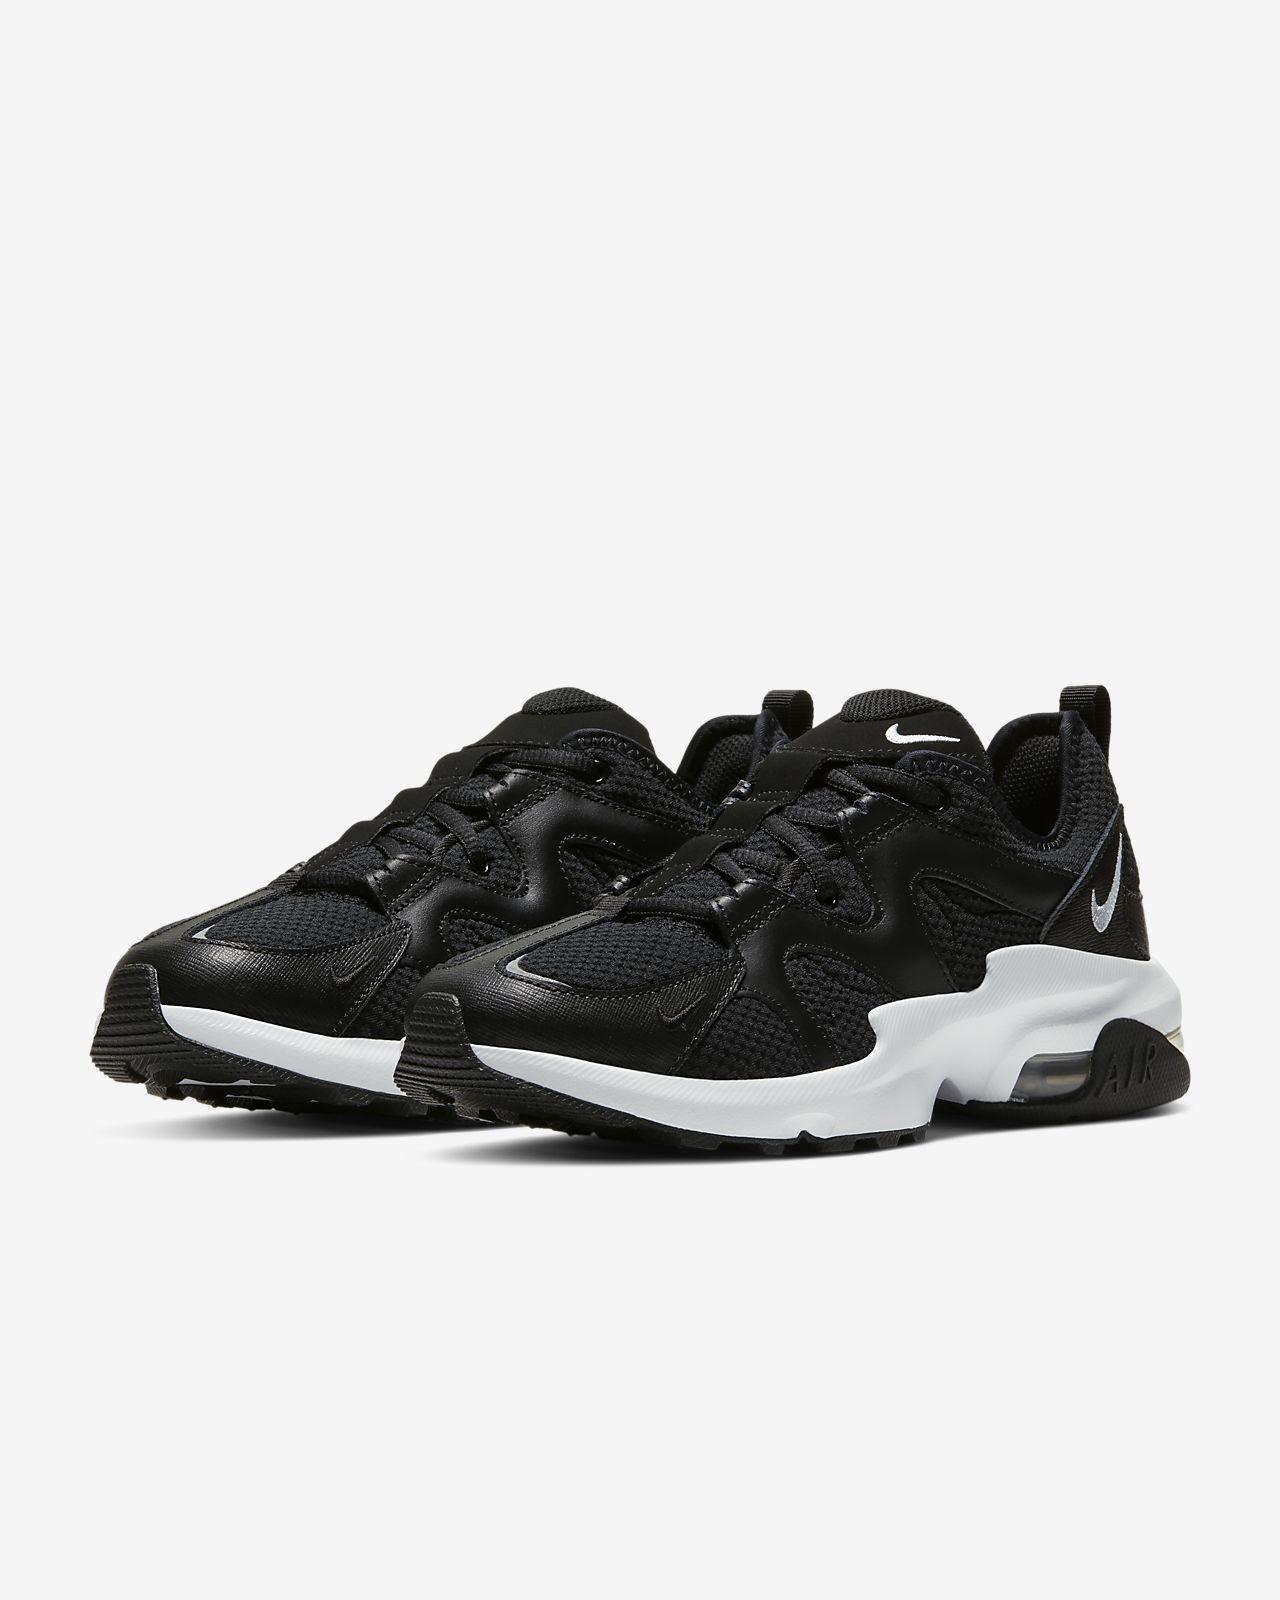 Sapatilhas Nike Air Max Graviton para mulher